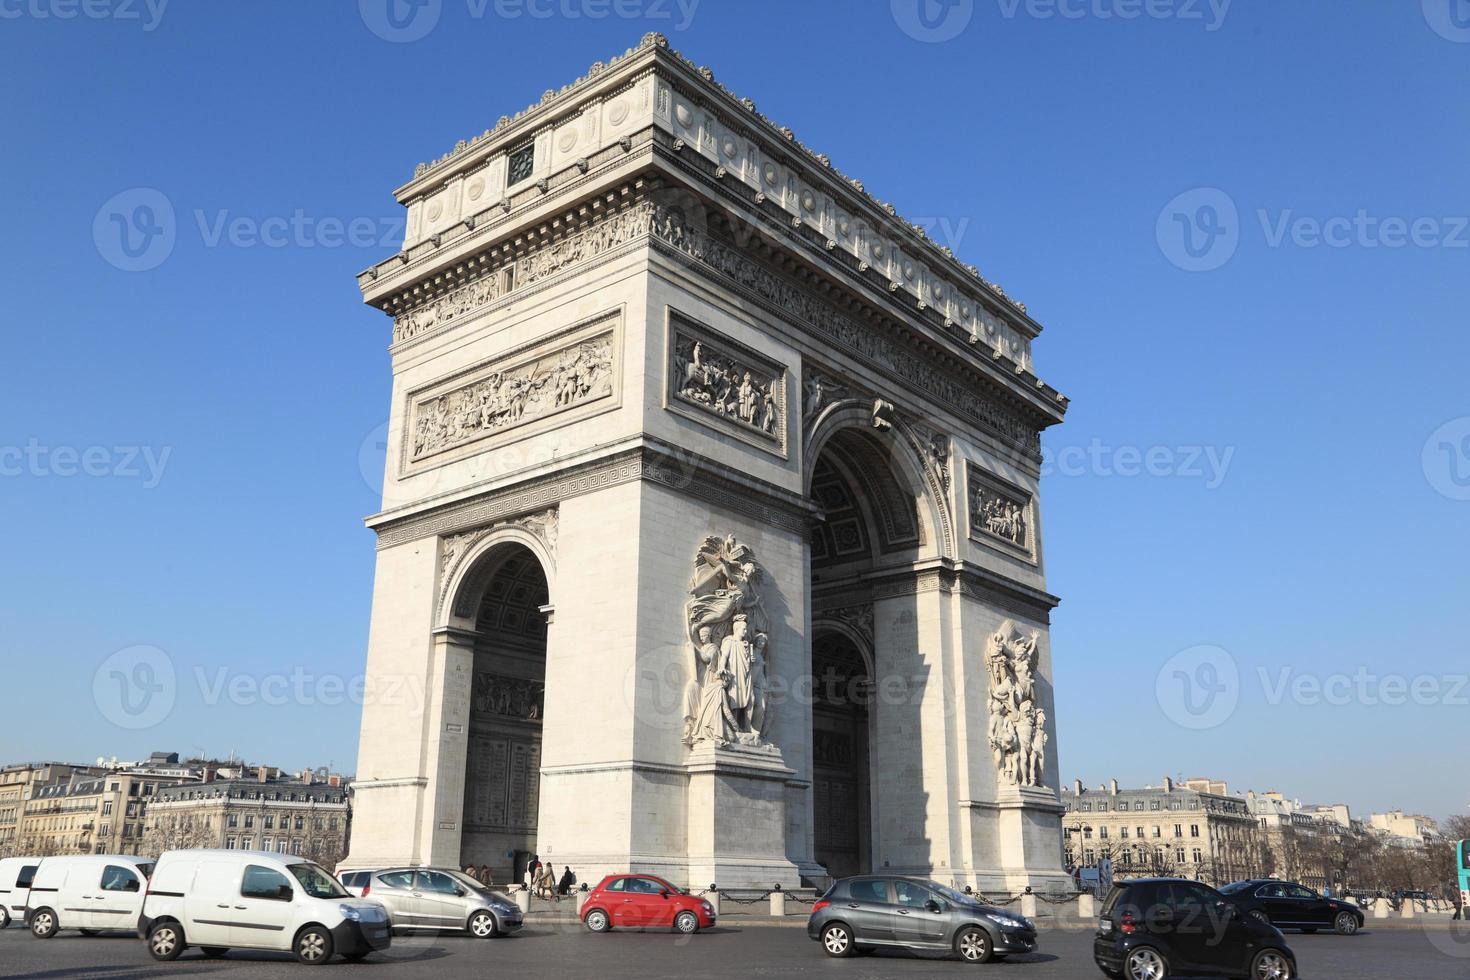 Place Charles de Gaulle Etoile photo